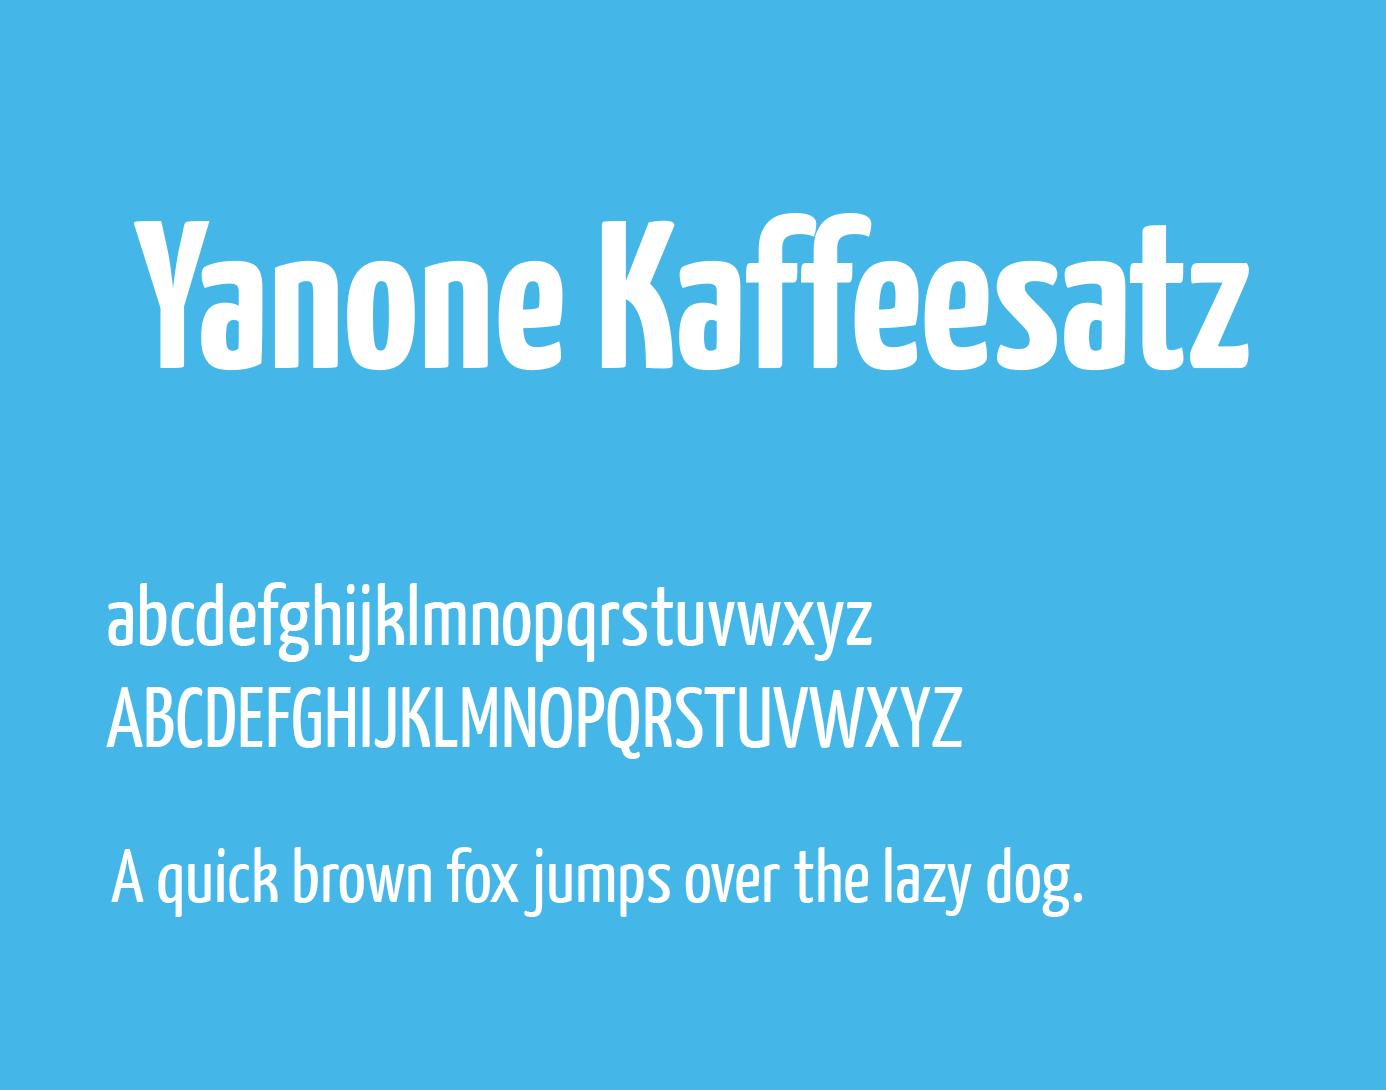 yanone-kaffeesatz